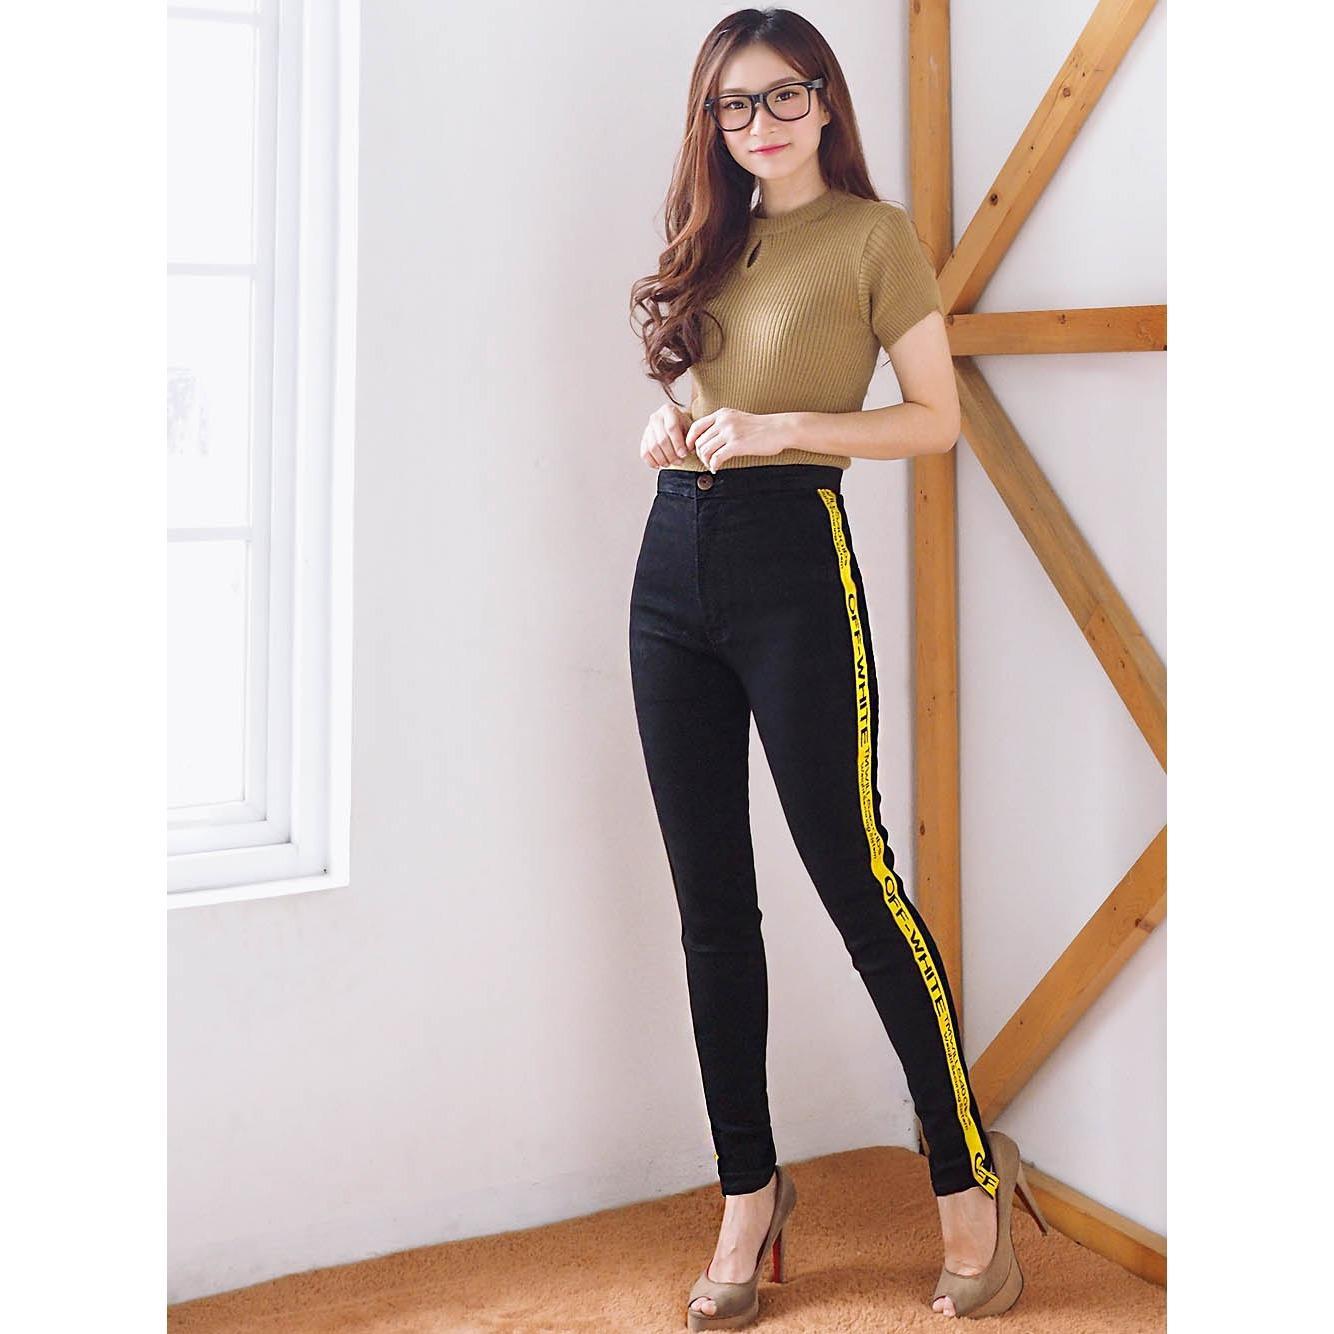 Jeans Celana wanita skinny HW - Blacko Yellow MAZ FR037 - Jeans Murah - Ancienstore